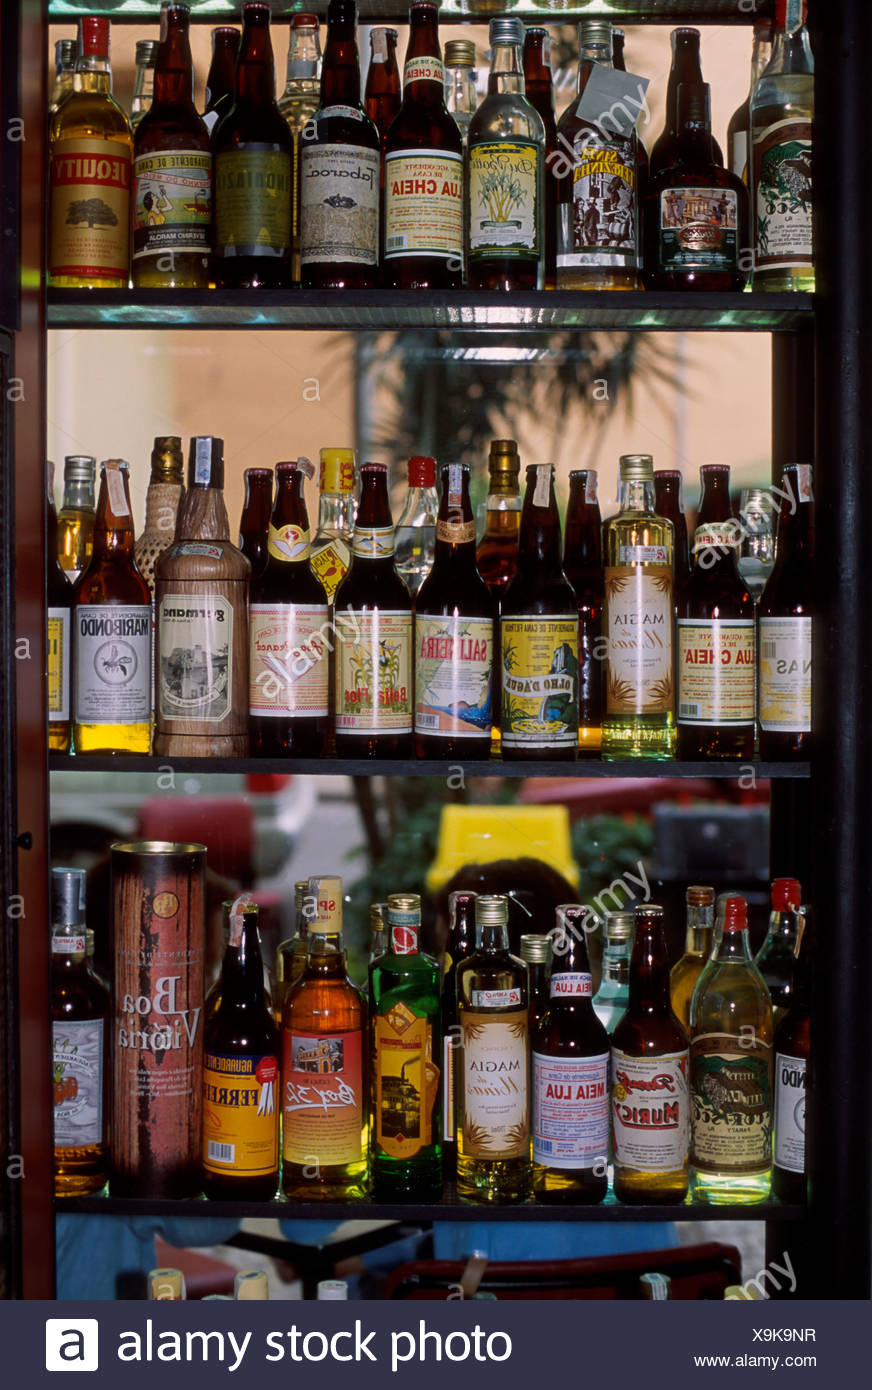 Academia da cachaça bar Rio de Janeiro Brazil Bottles of cachaça Brazilian popular white rum - Stock Image